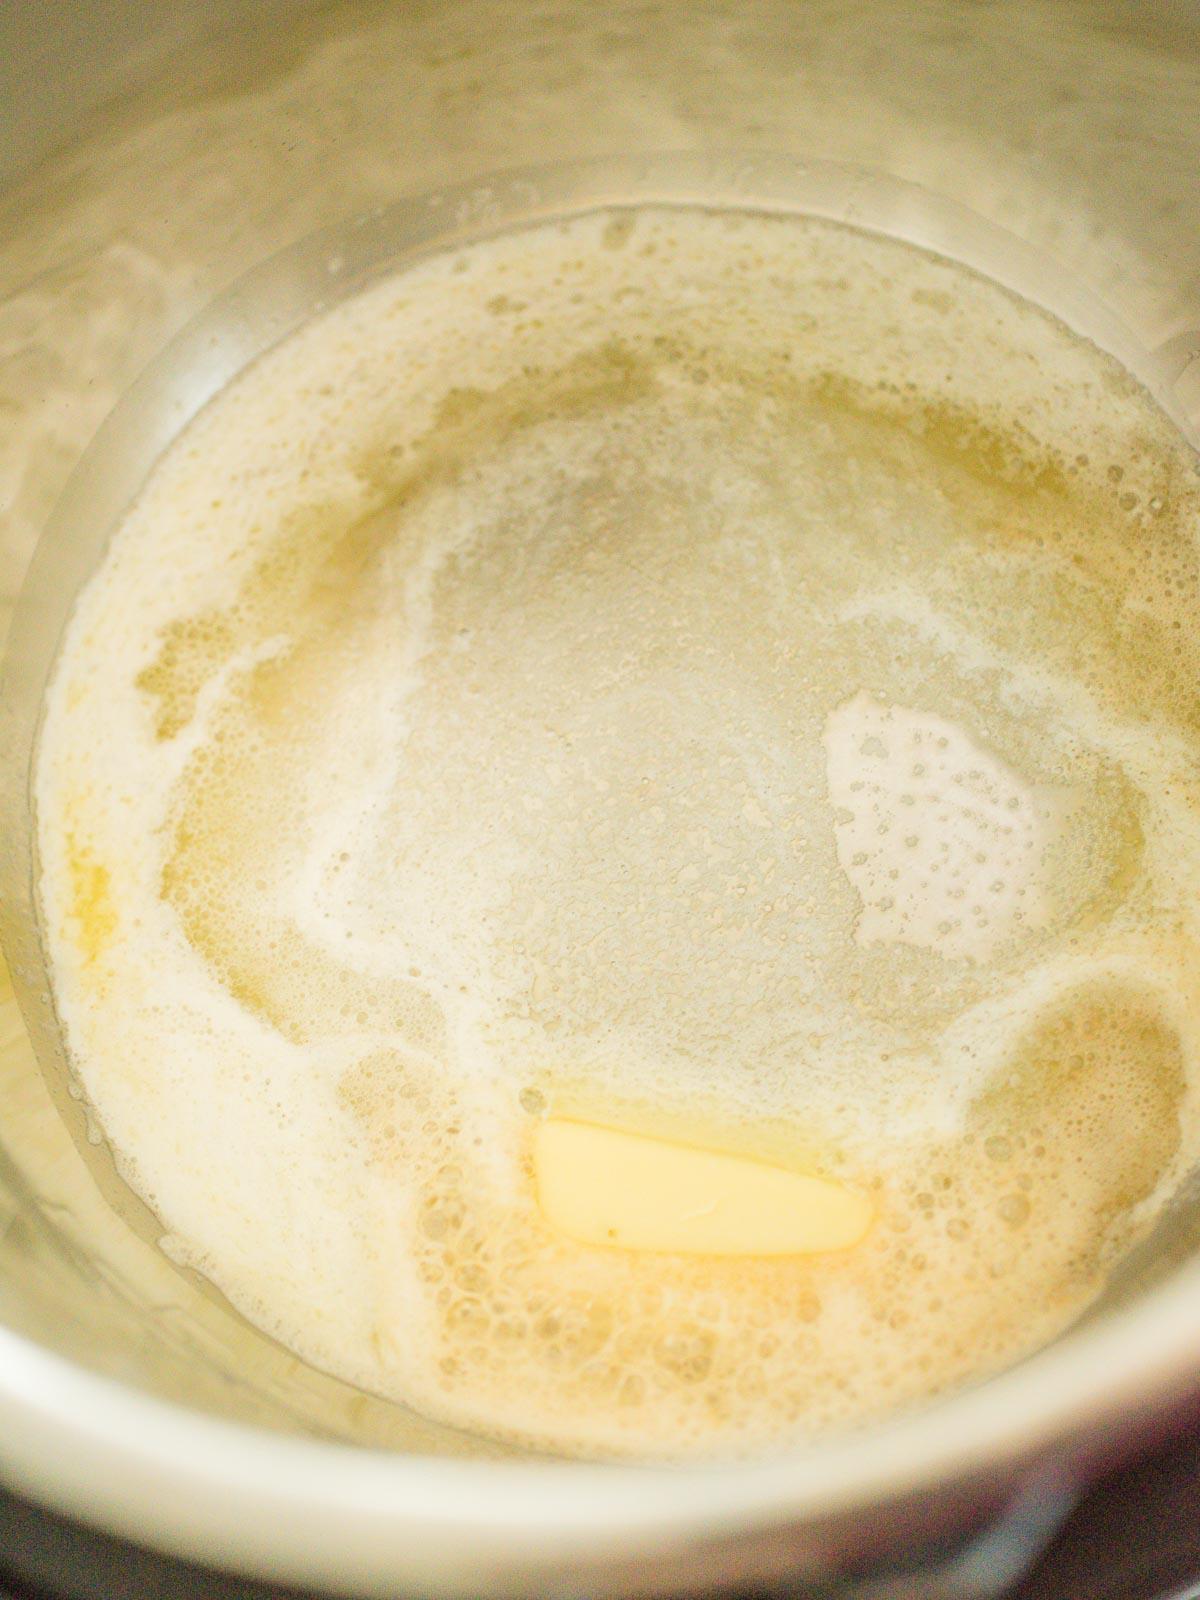 butter melting in instant pot